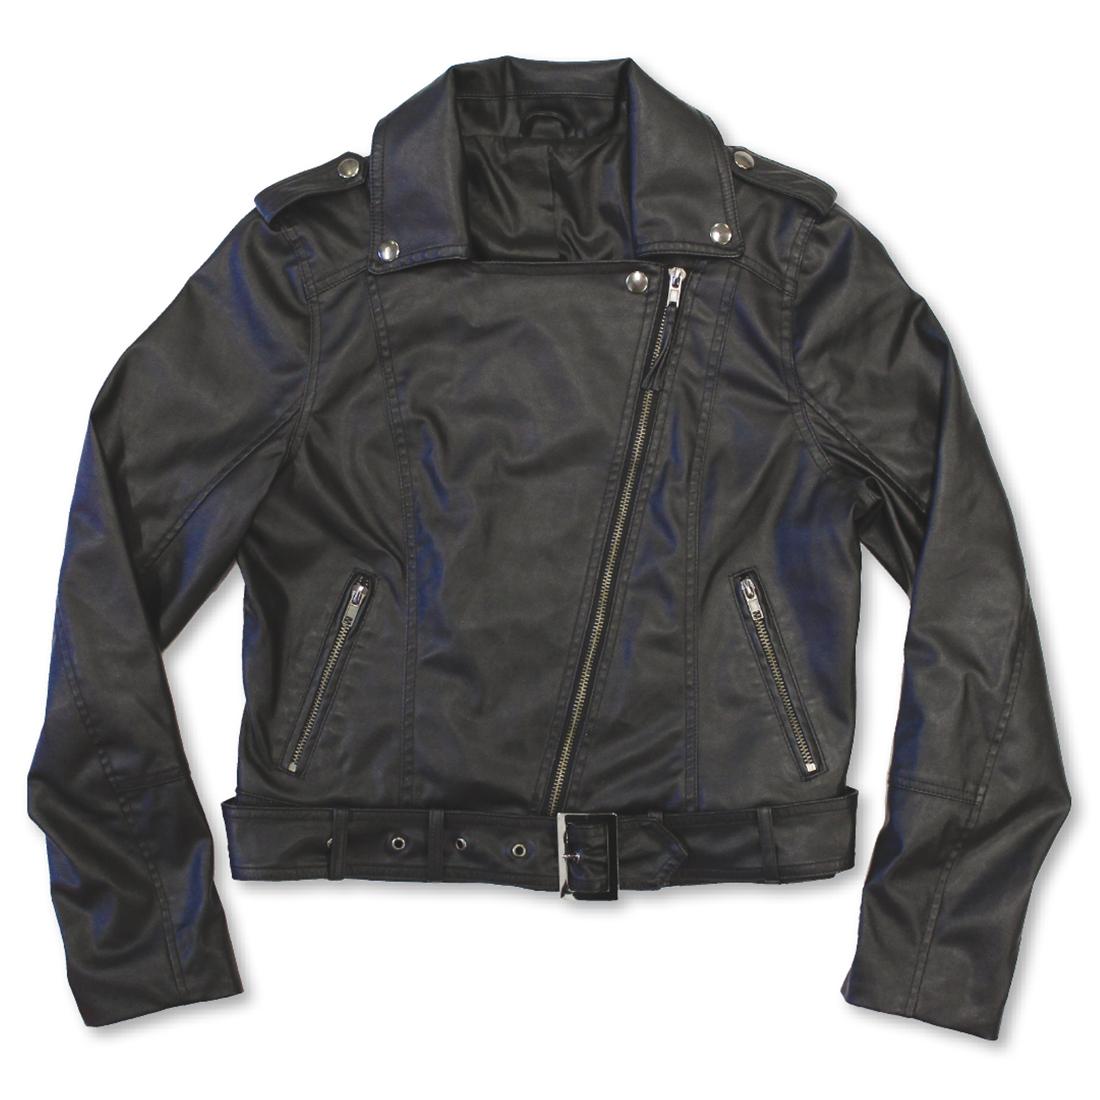 raven faux leather biker jacket $ 129 95 badass biker jacket fabric